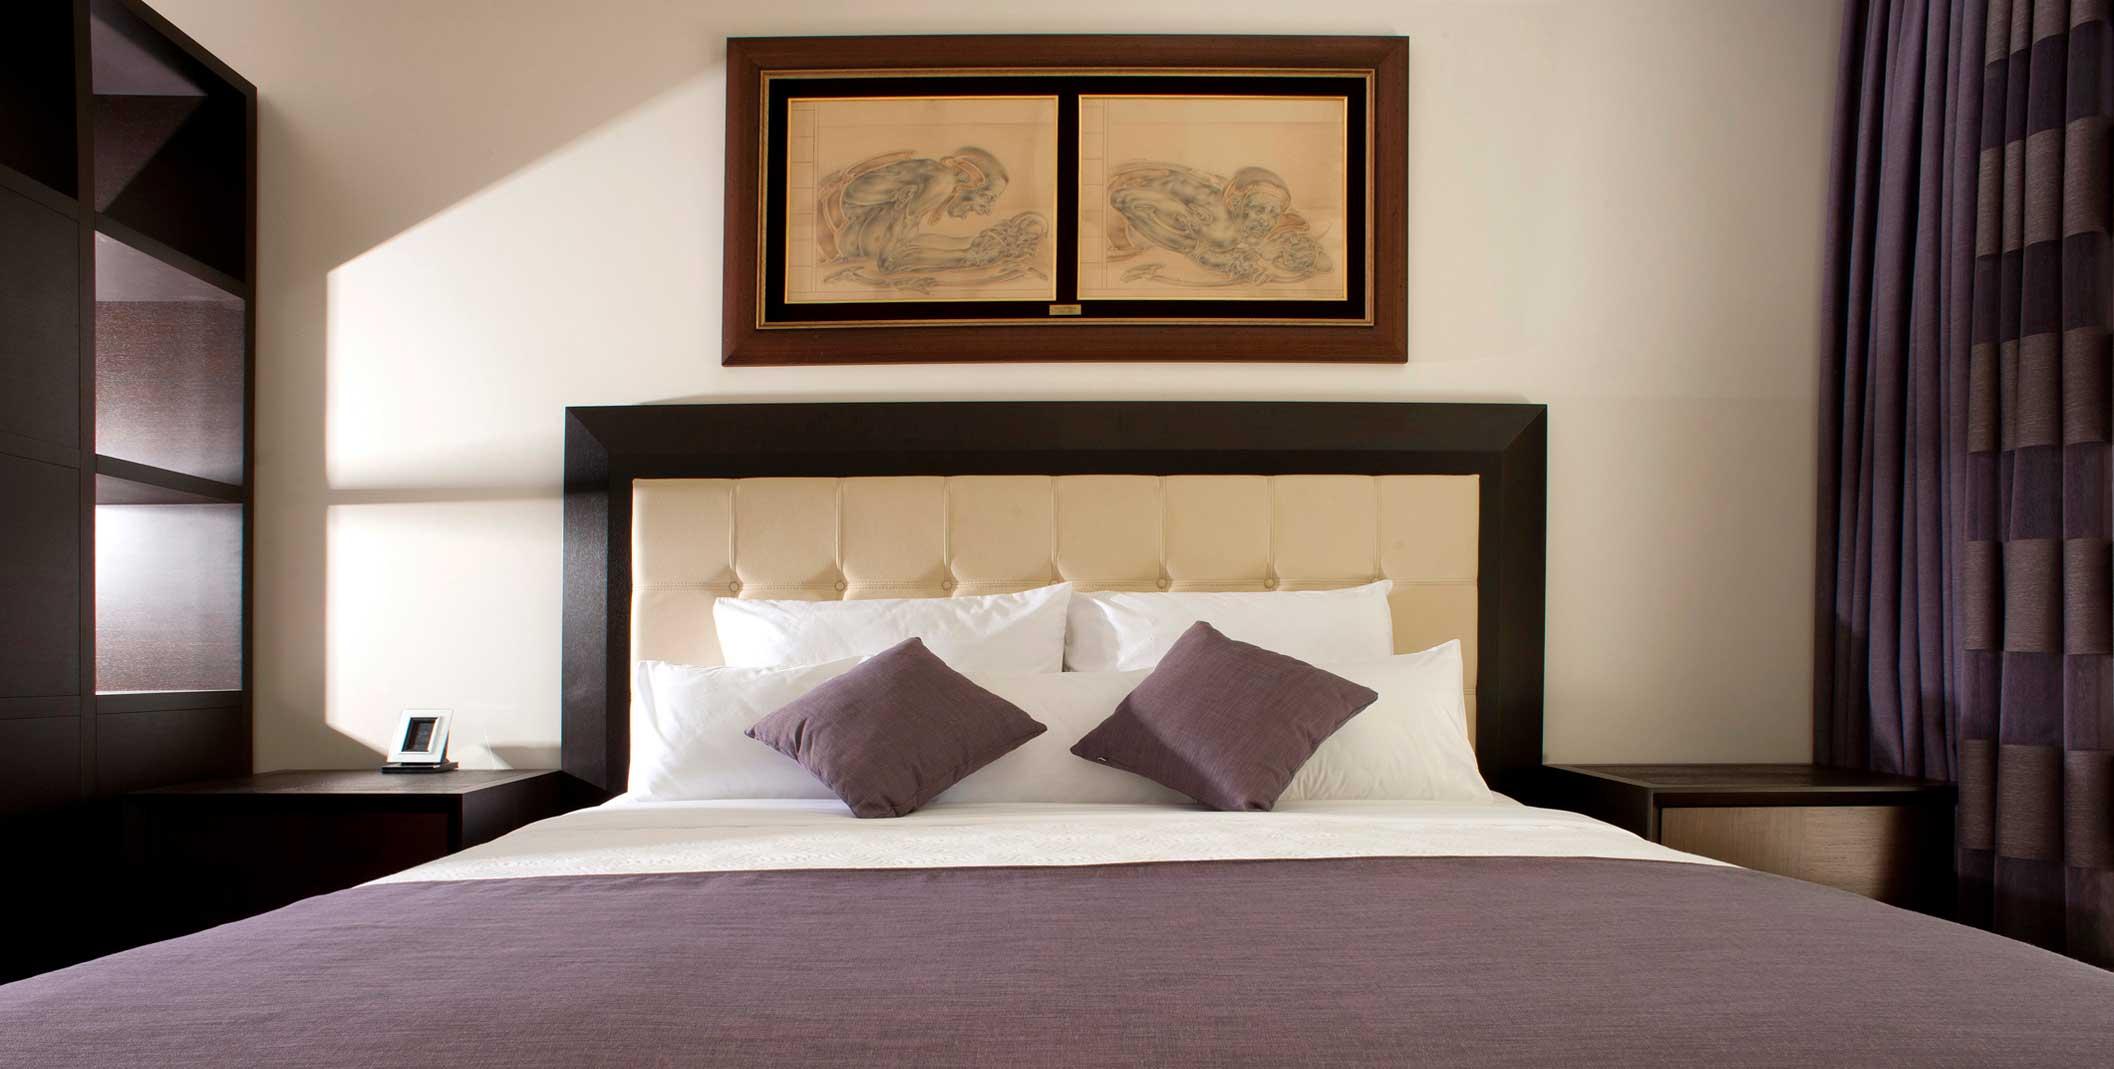 Apartmani Alexandar Montenegro Luxury Suites & Spa, Budva, Crna Gora